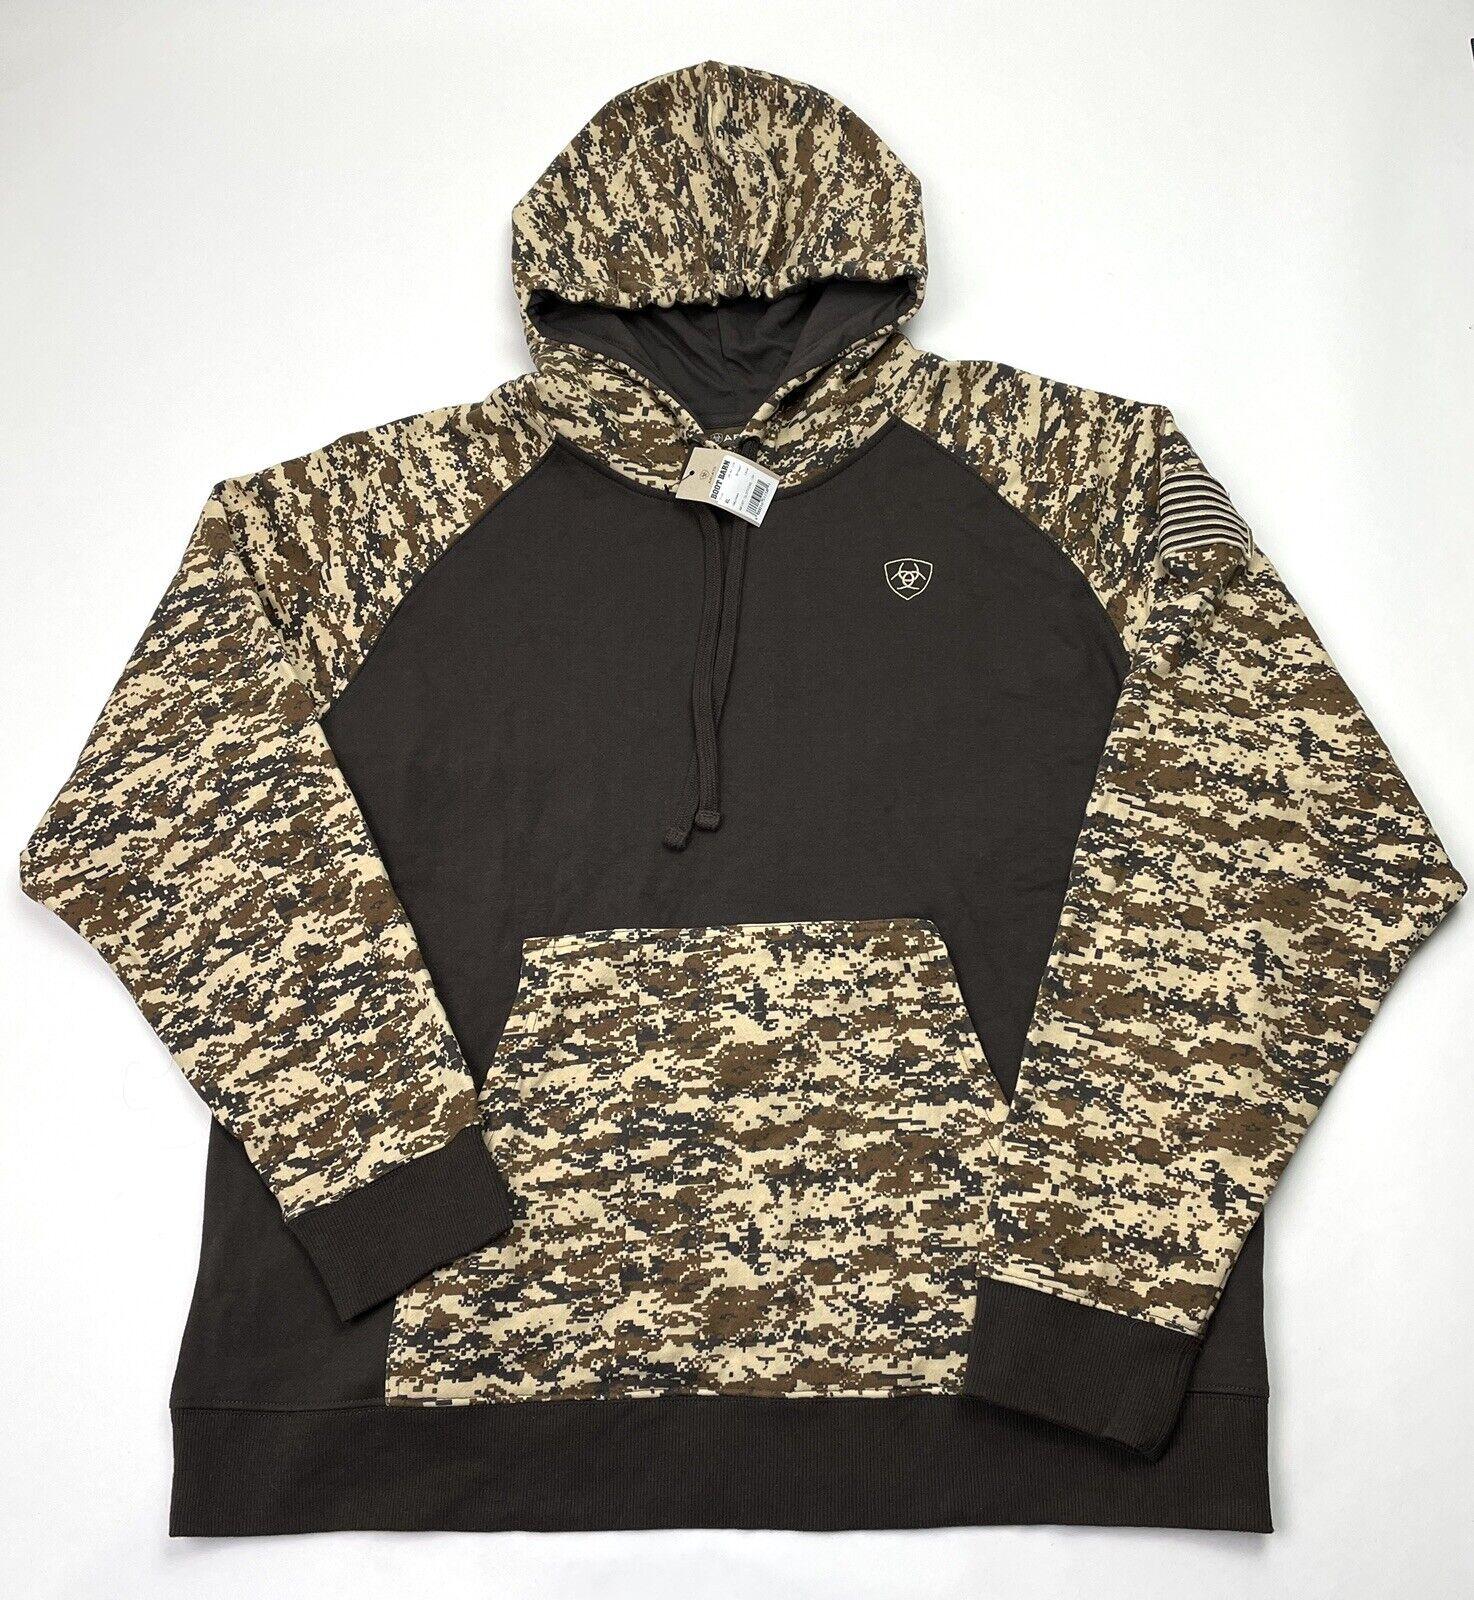 Ariat Mens Patriot Desert Digital Camo Hoodie Size XL 10022684